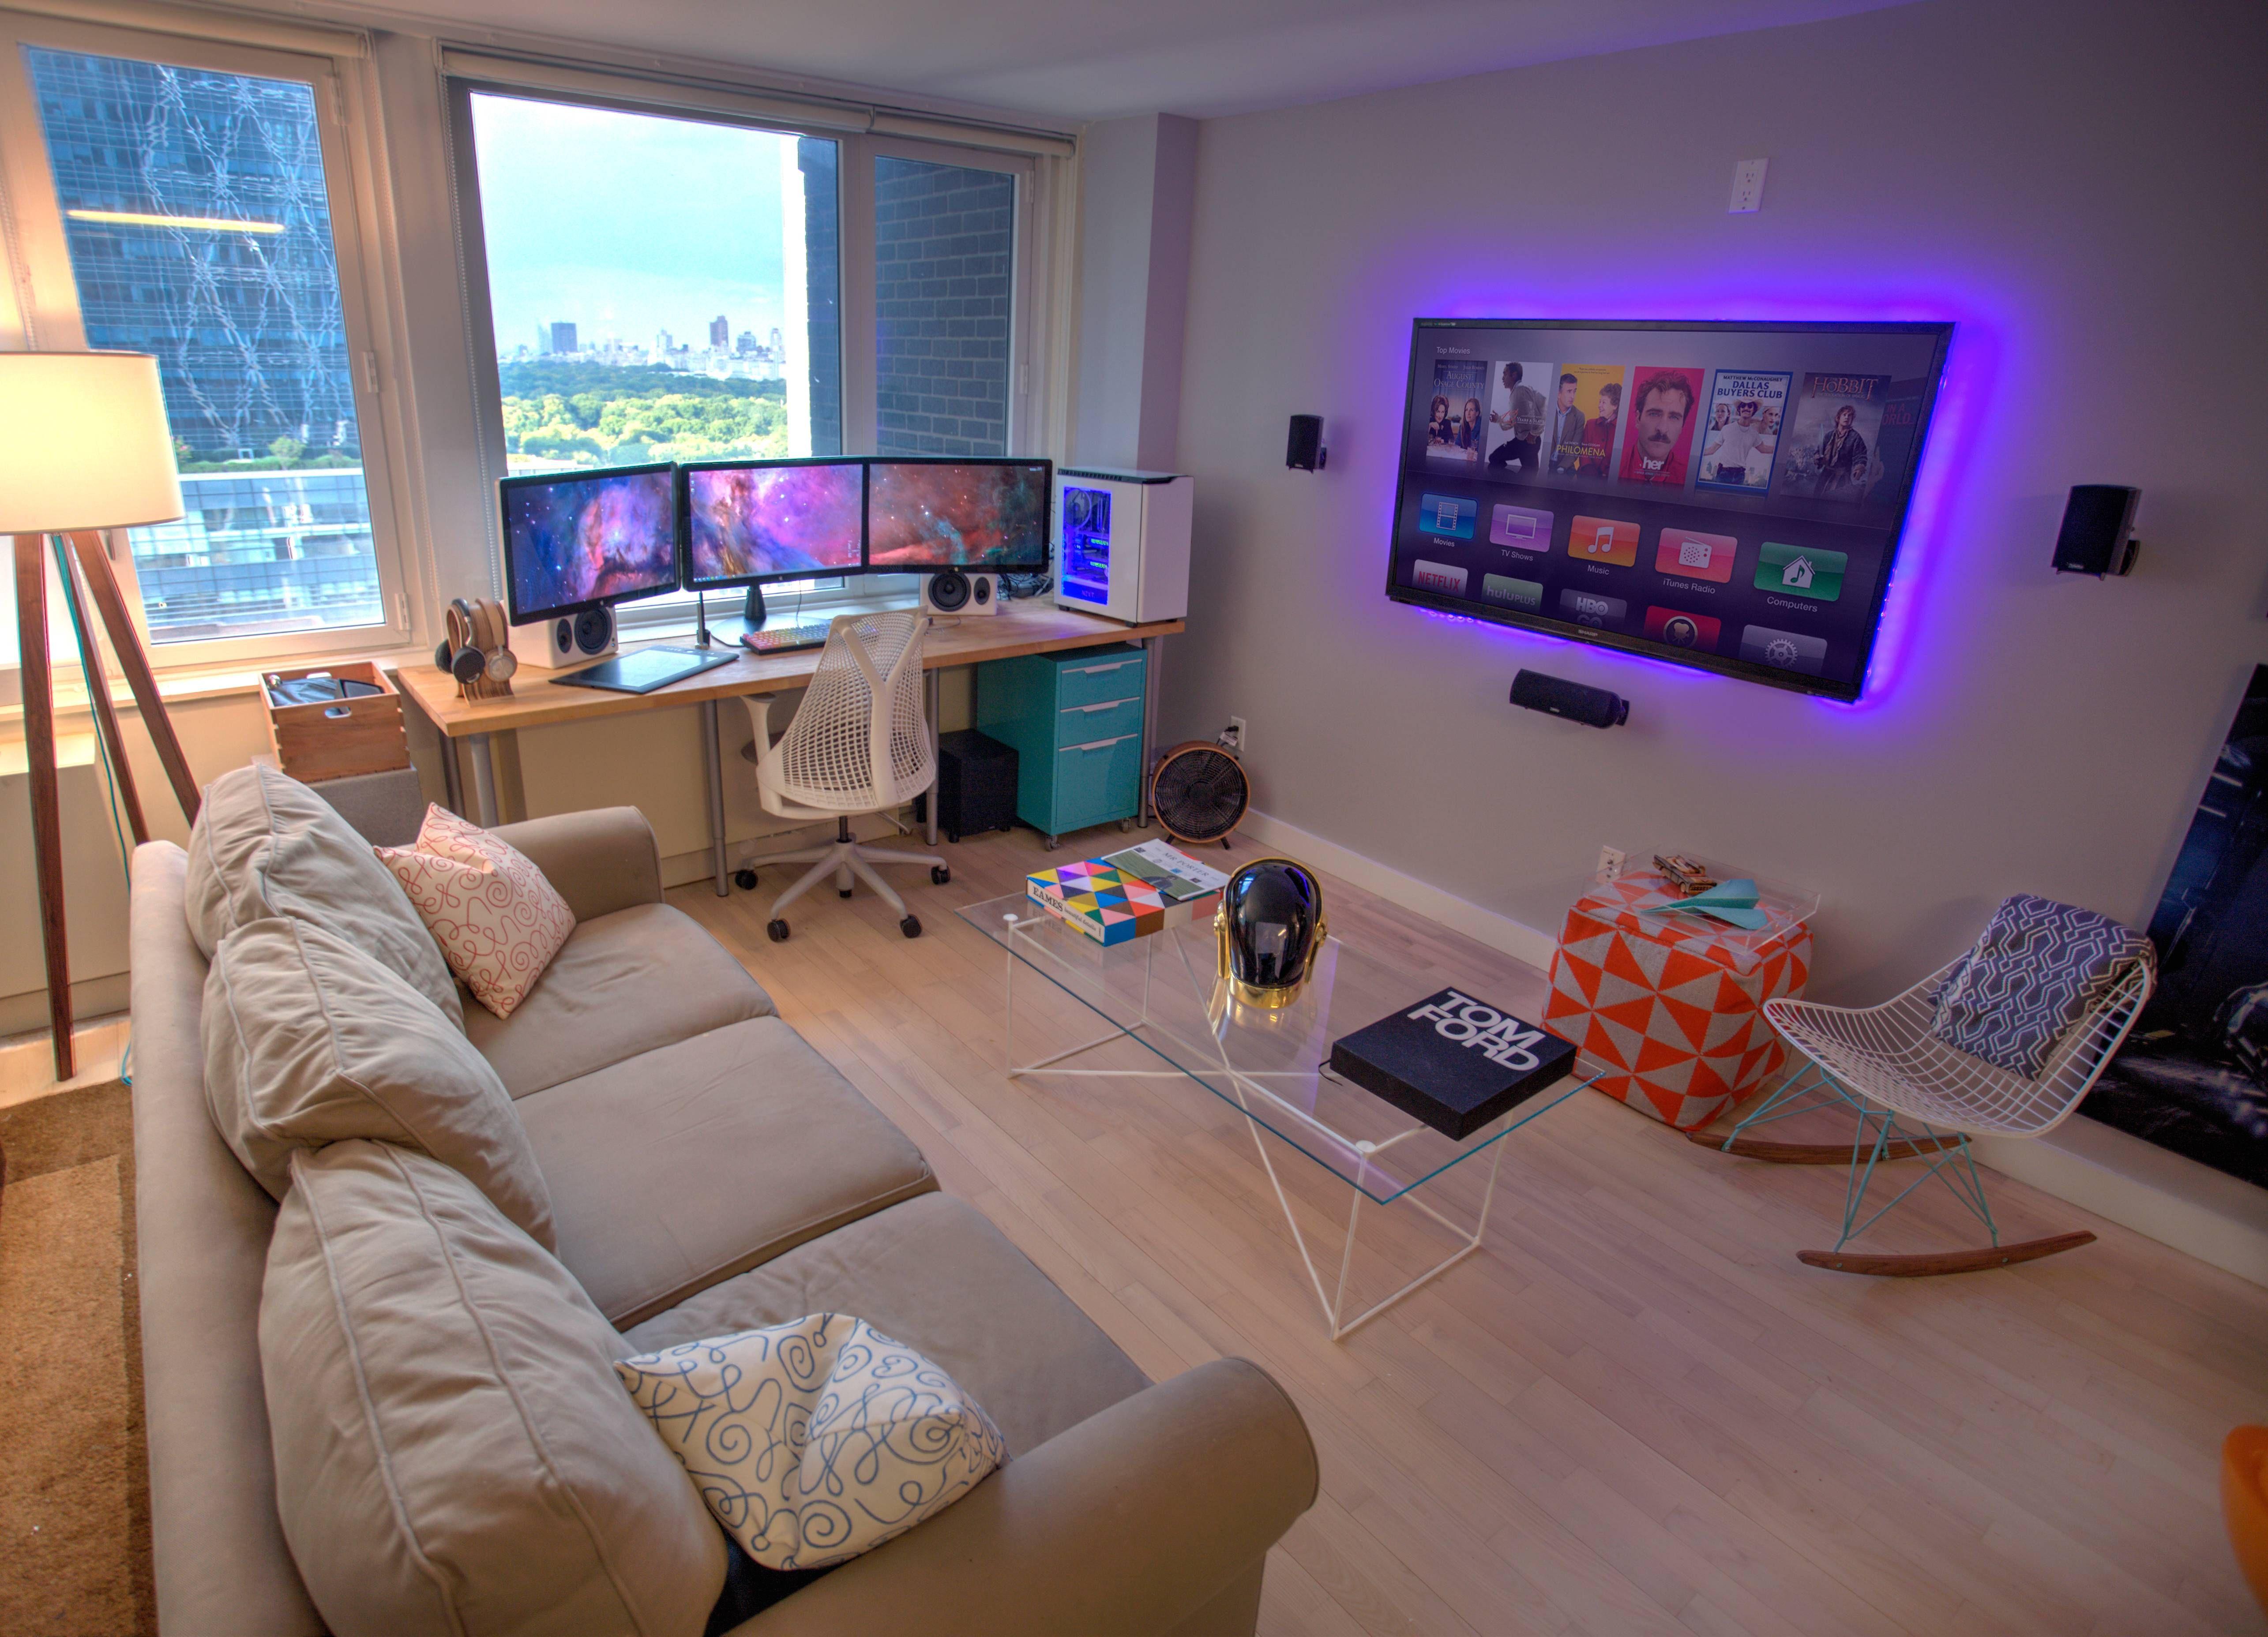 Living Room Gaming Pc Simple Hall False Ceiling Designs For My Battlestation Desk Setup Pinterest Game Design Could Be A Good Fit Tower More